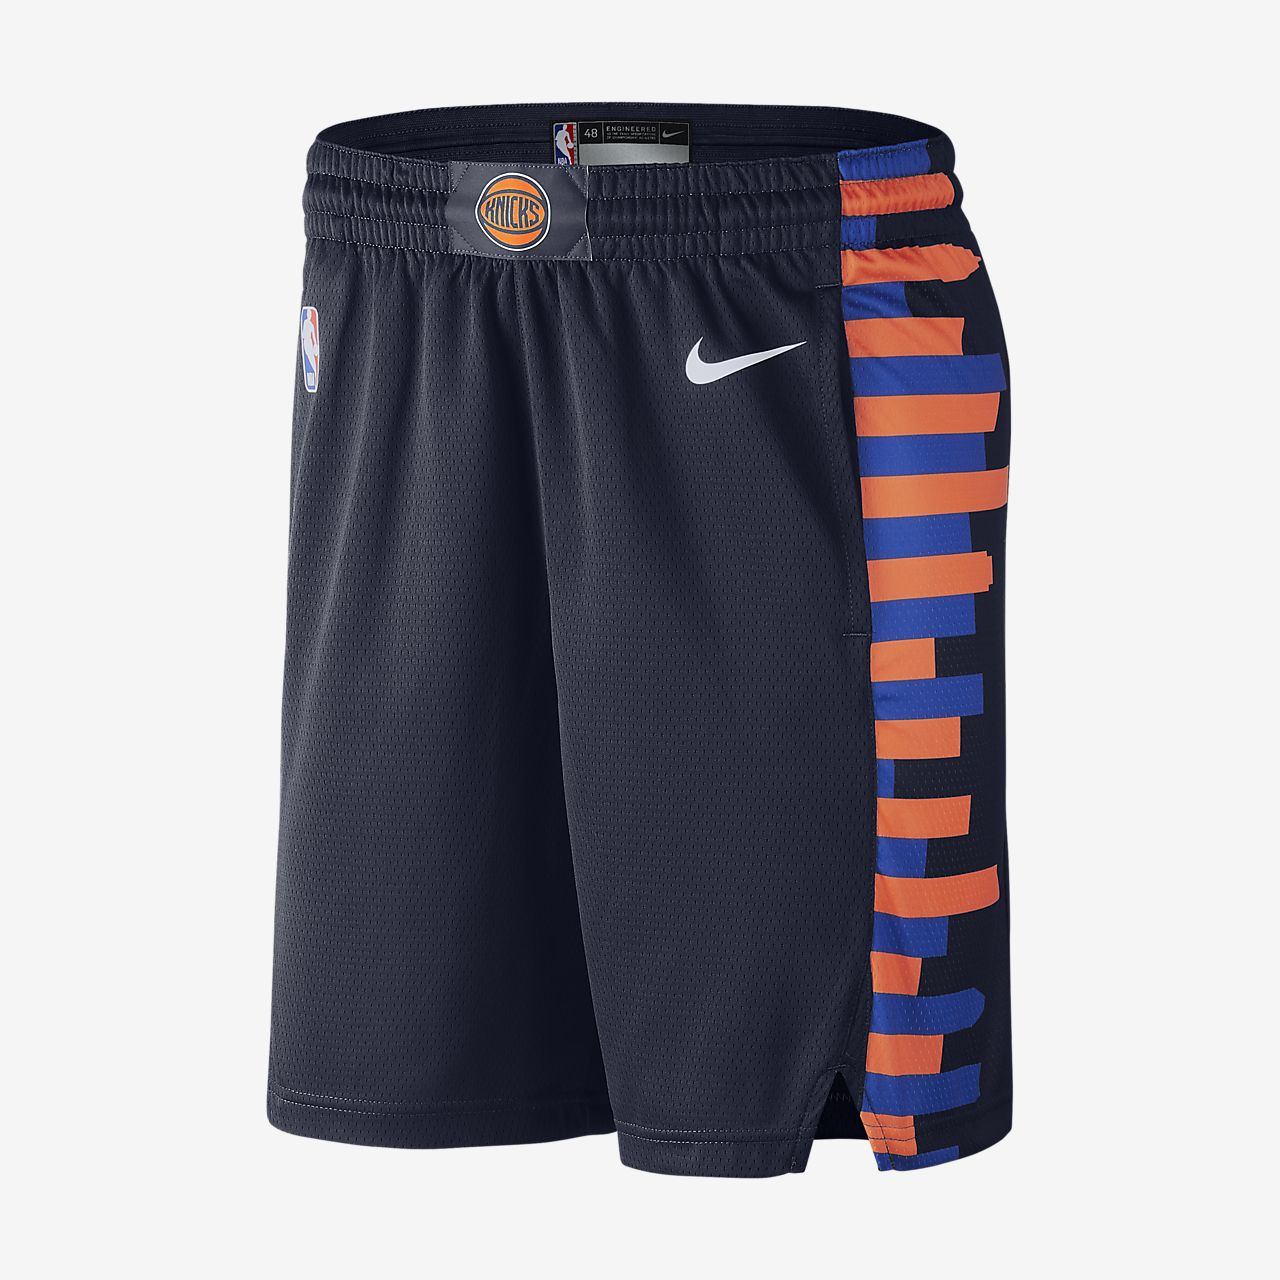 Knicks City Edition Nike NBA Swingman-shorts